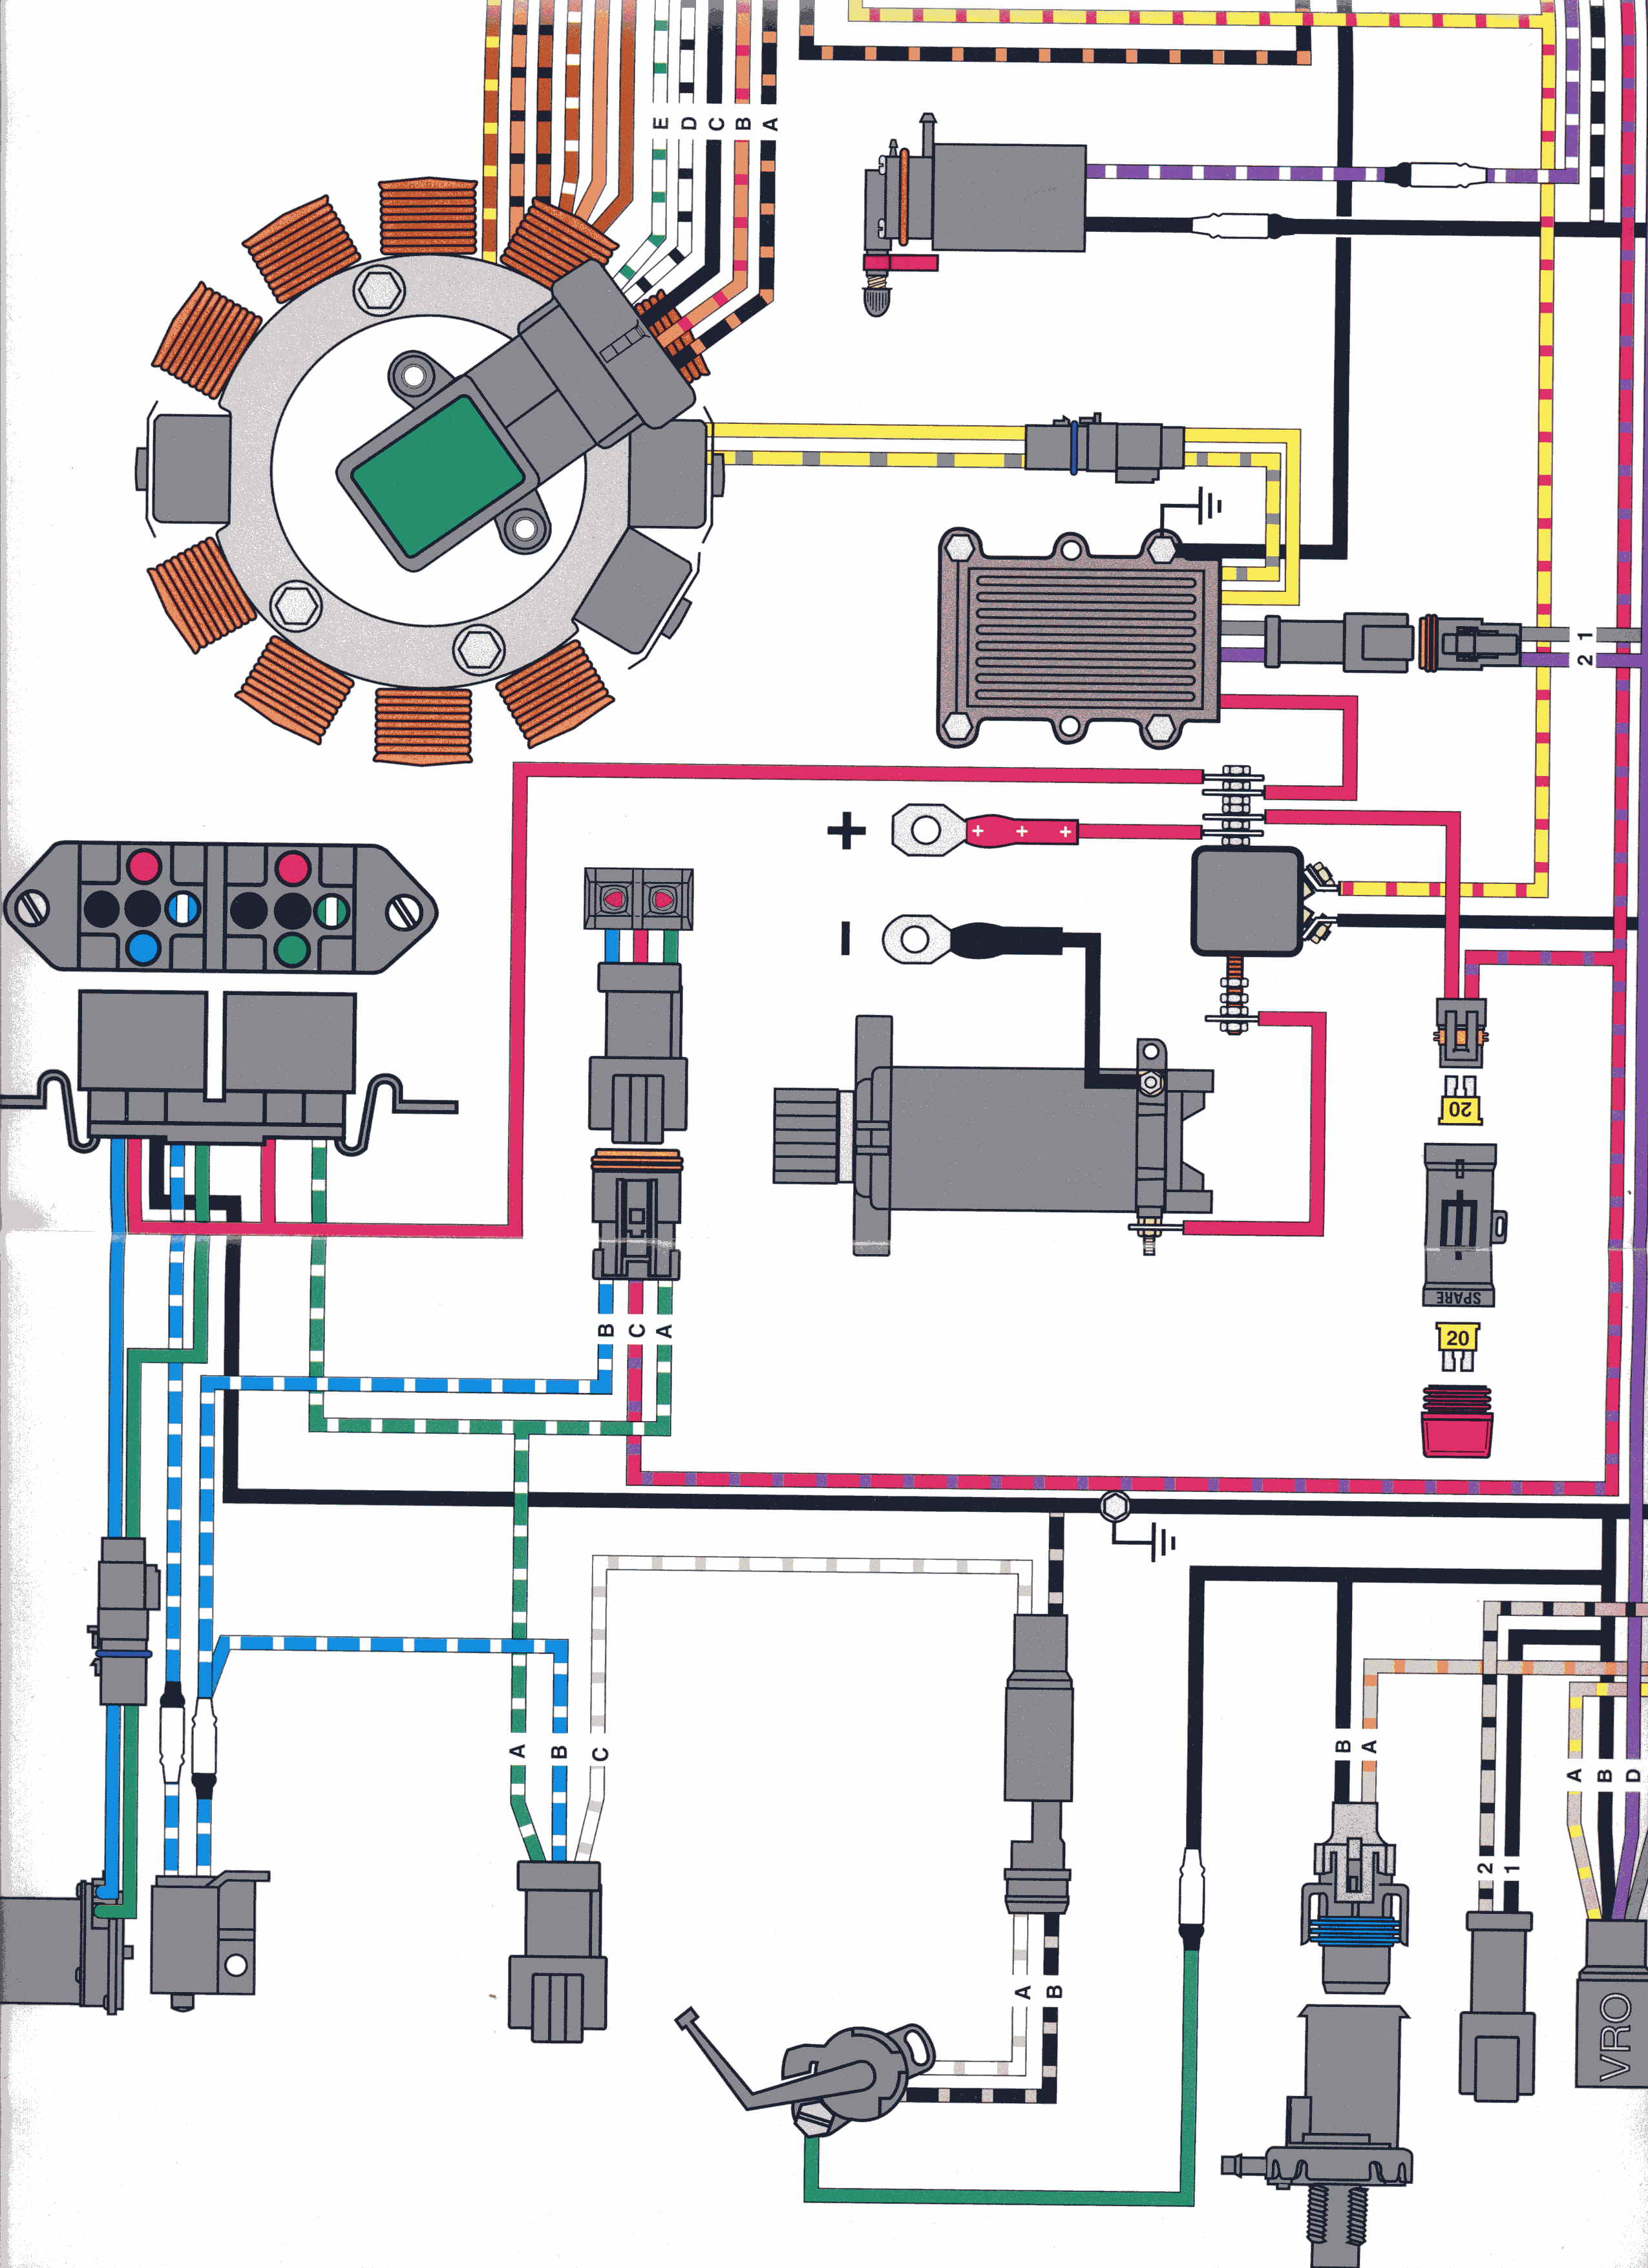 VN_9242] 35 Hp Johnson Wiring Diagram Free DiagramOlyti Embo Ungo Momece Mohammedshrine Librar Wiring 101